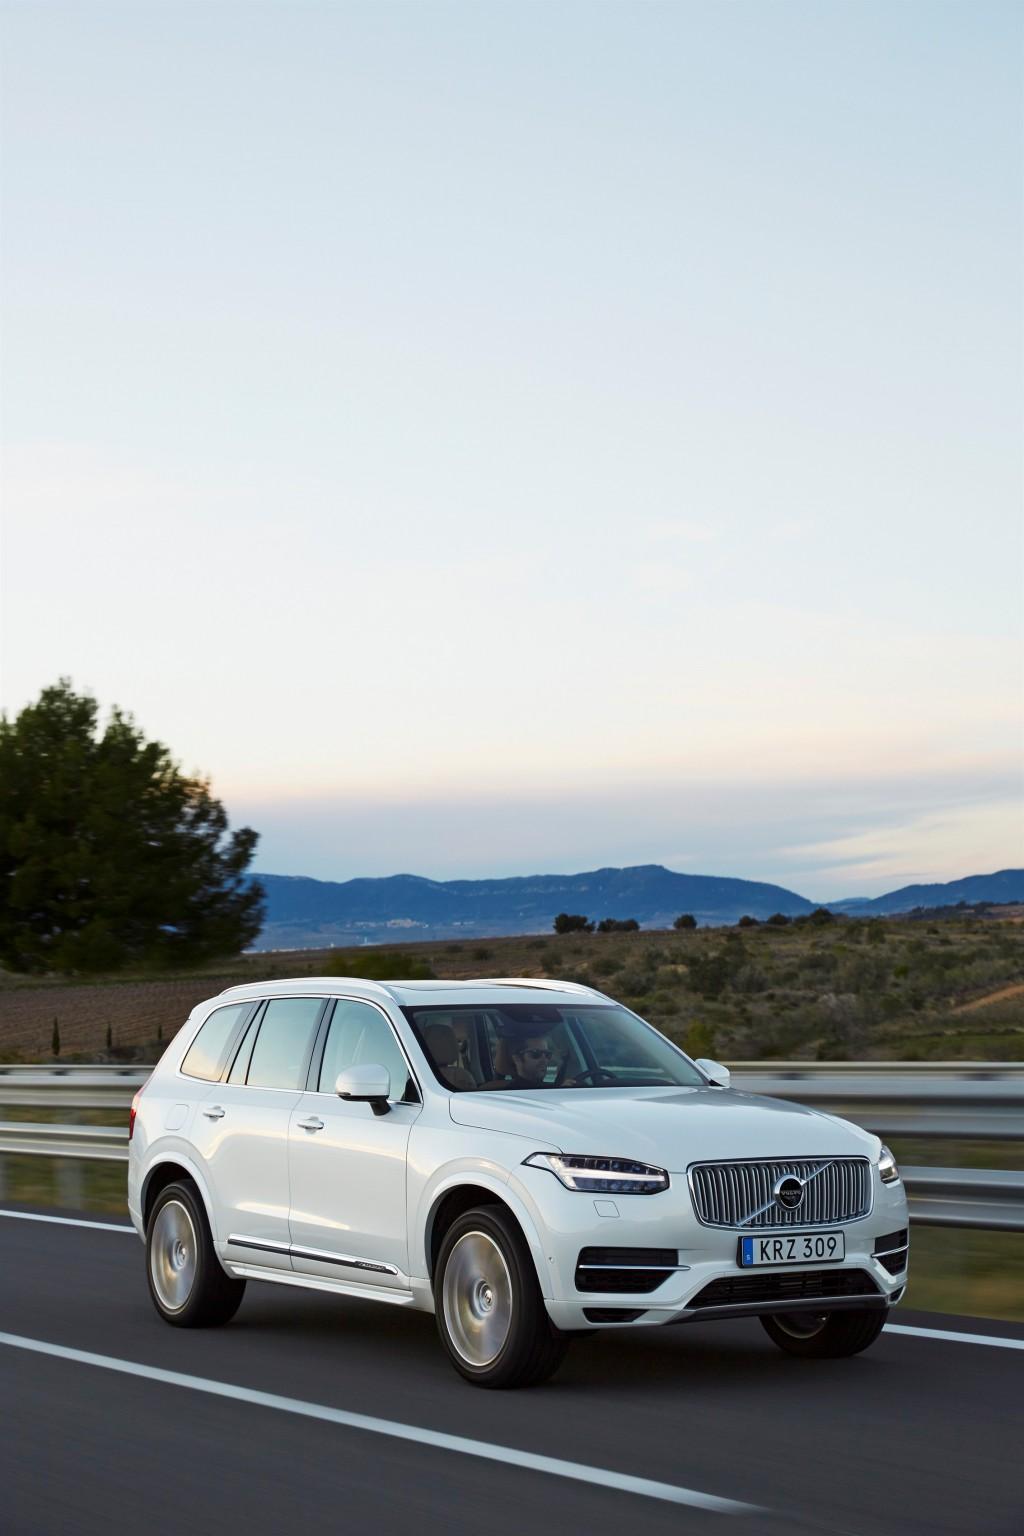 157808_The_new_Volvo_XC90_T8_Twin_Engine_petrol_plug_in_hybrid_driven_in_Tarragona